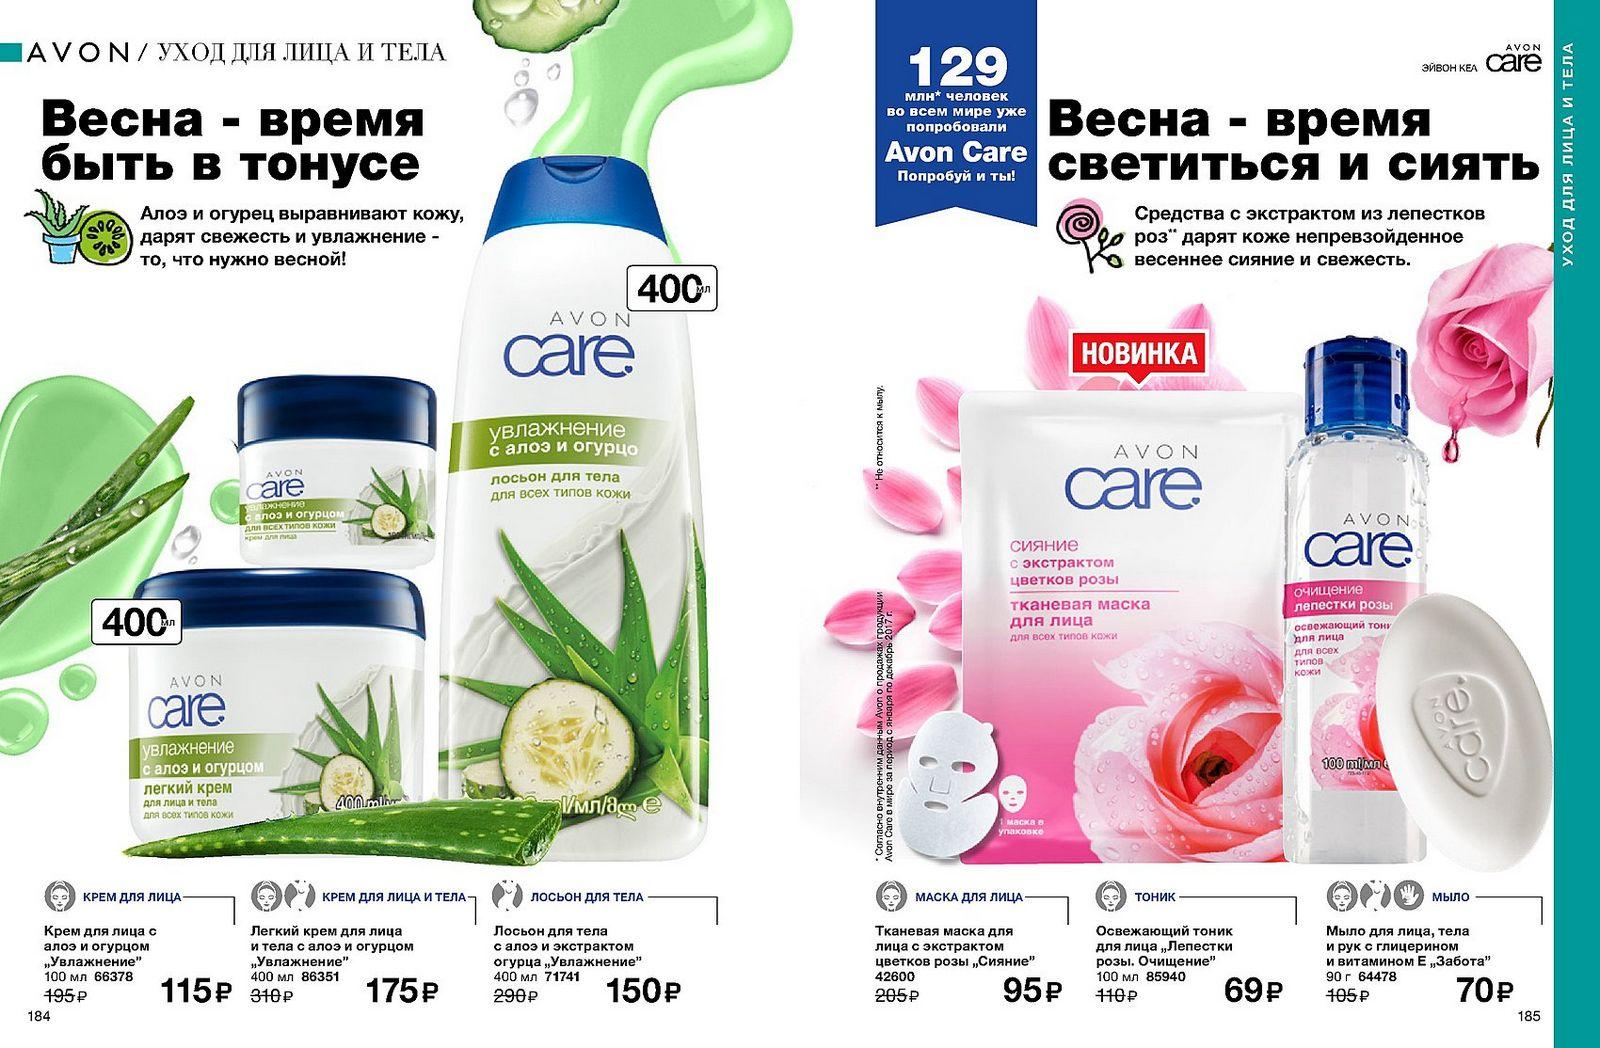 Avon интернет магазин украина косметика academie купить в иркутске